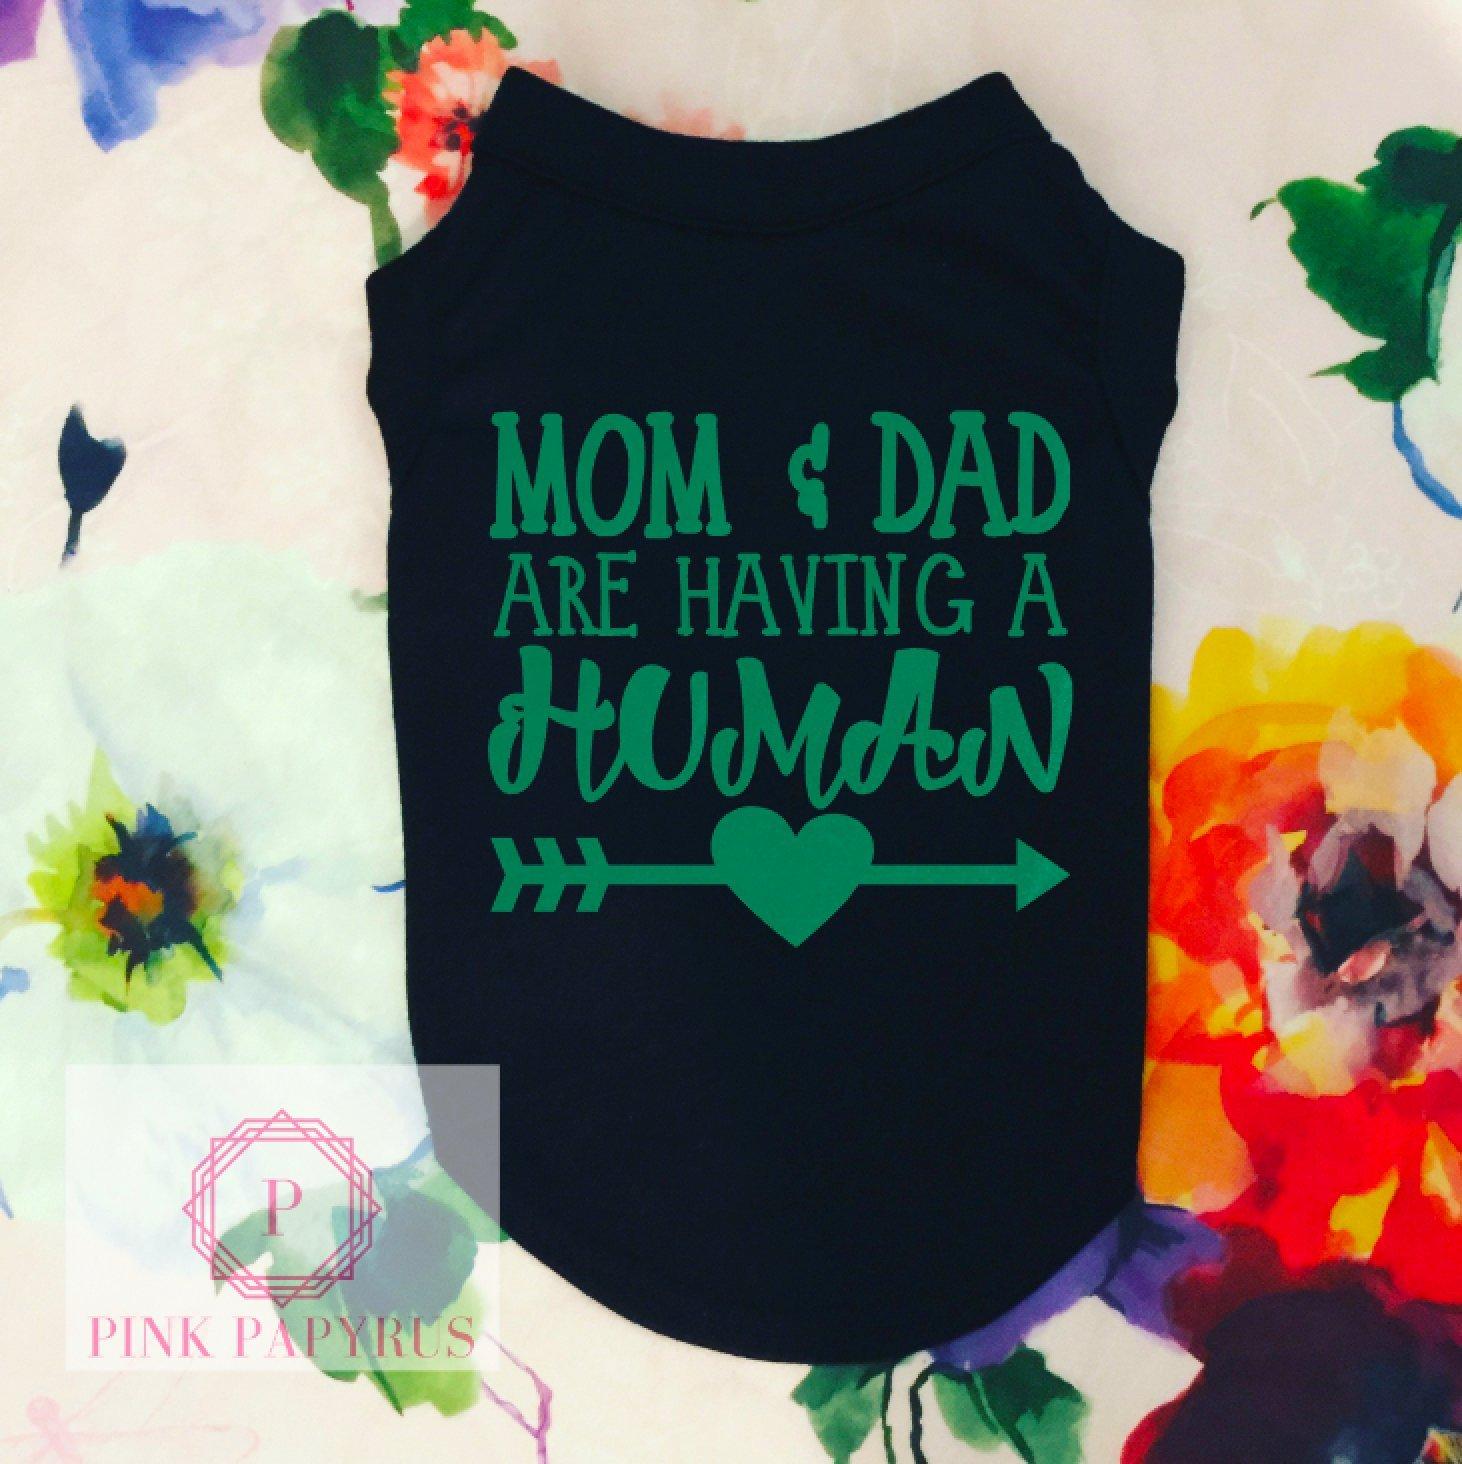 Mom & Dad Are Having A Human Dog Shirt